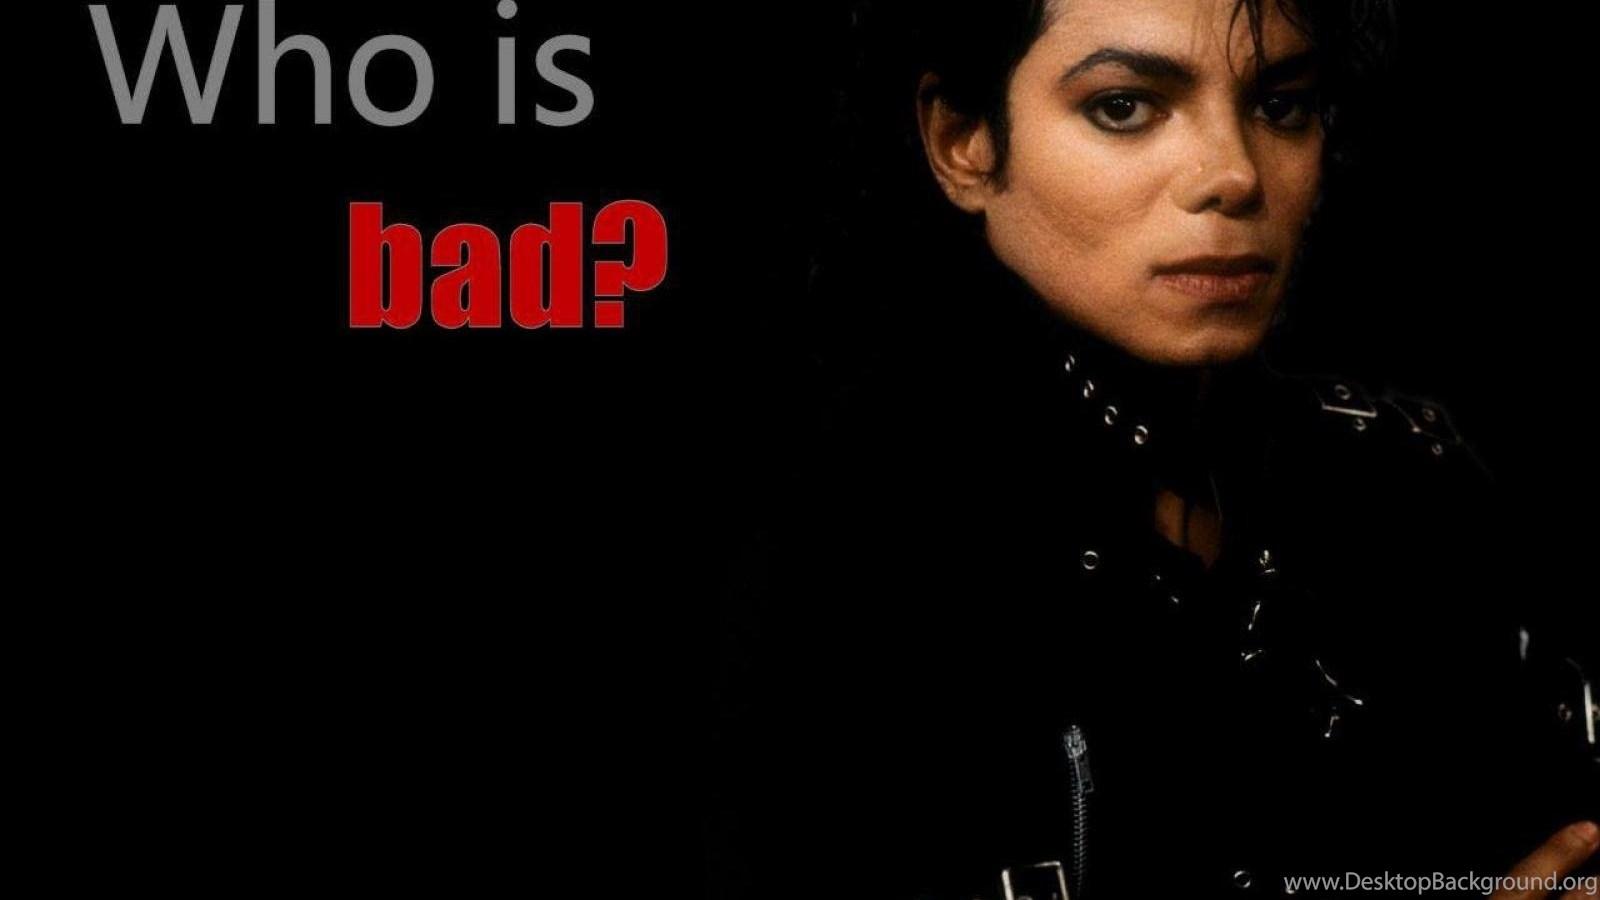 Michael Jackson Bad Wallpapers Hd Cool 7 Hd Wallpapers Desktop